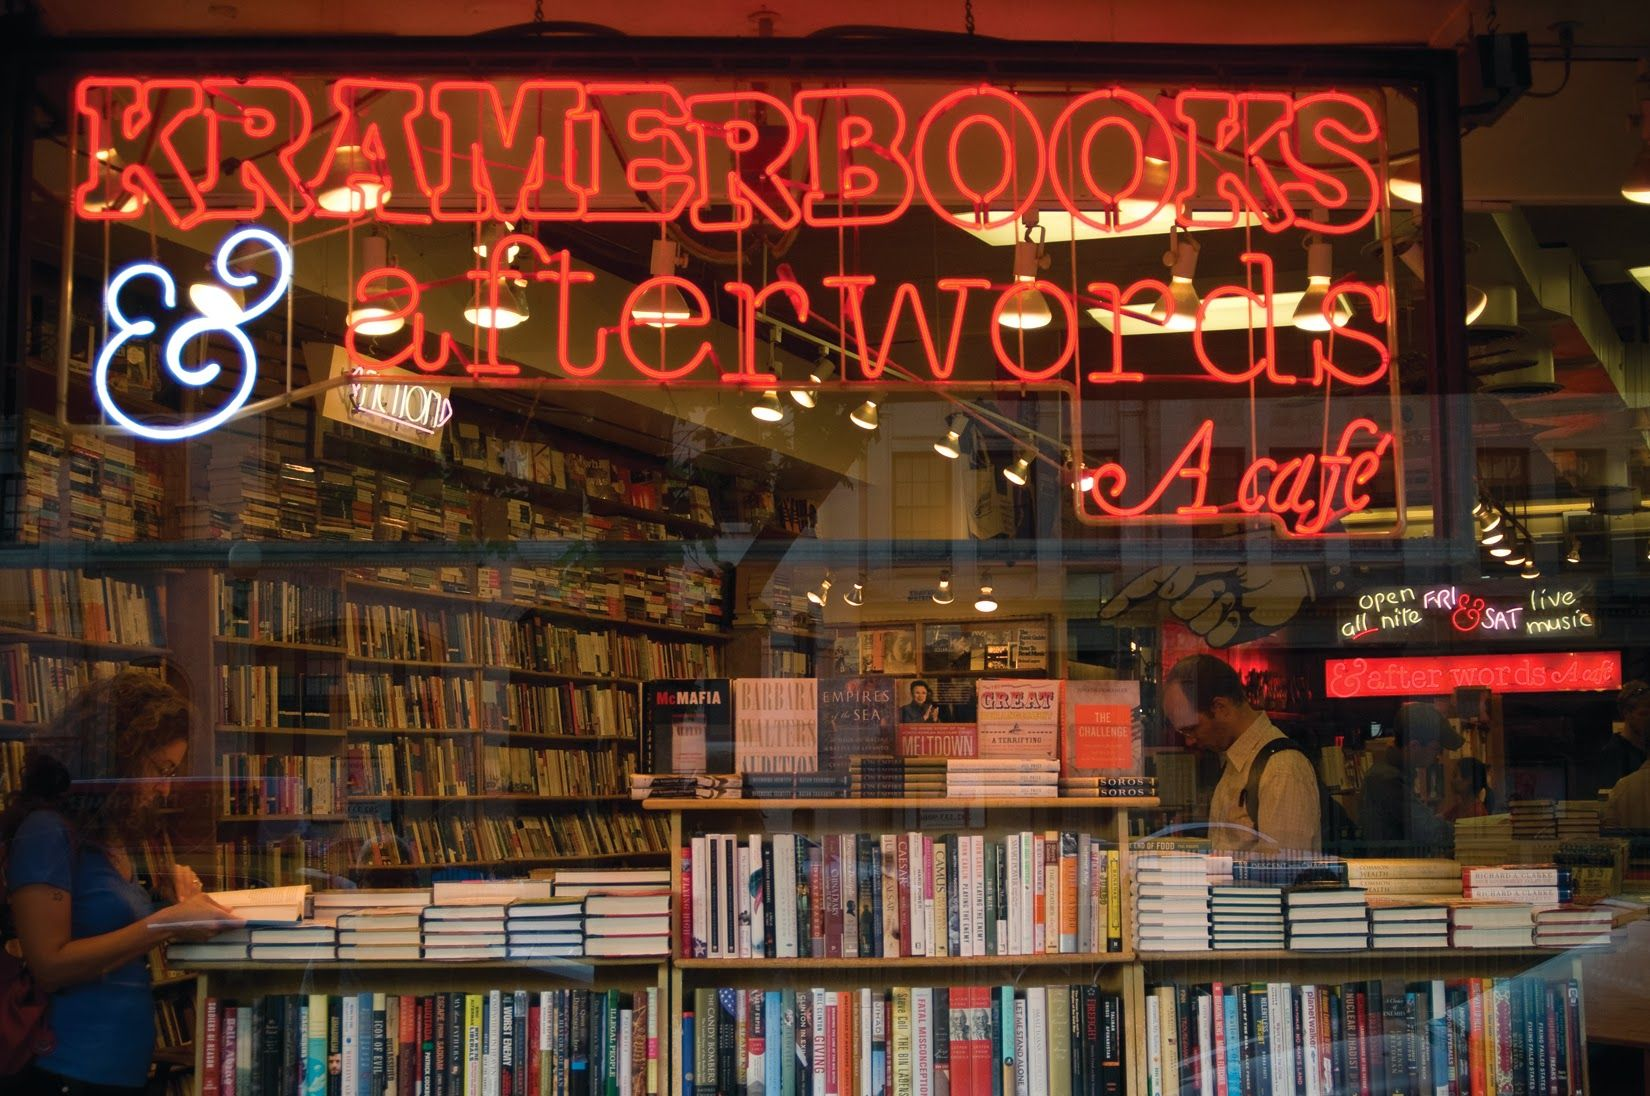 Kramerbooks Afterwords Cafe About Us Washington Dupont Circle Restaurant Offers